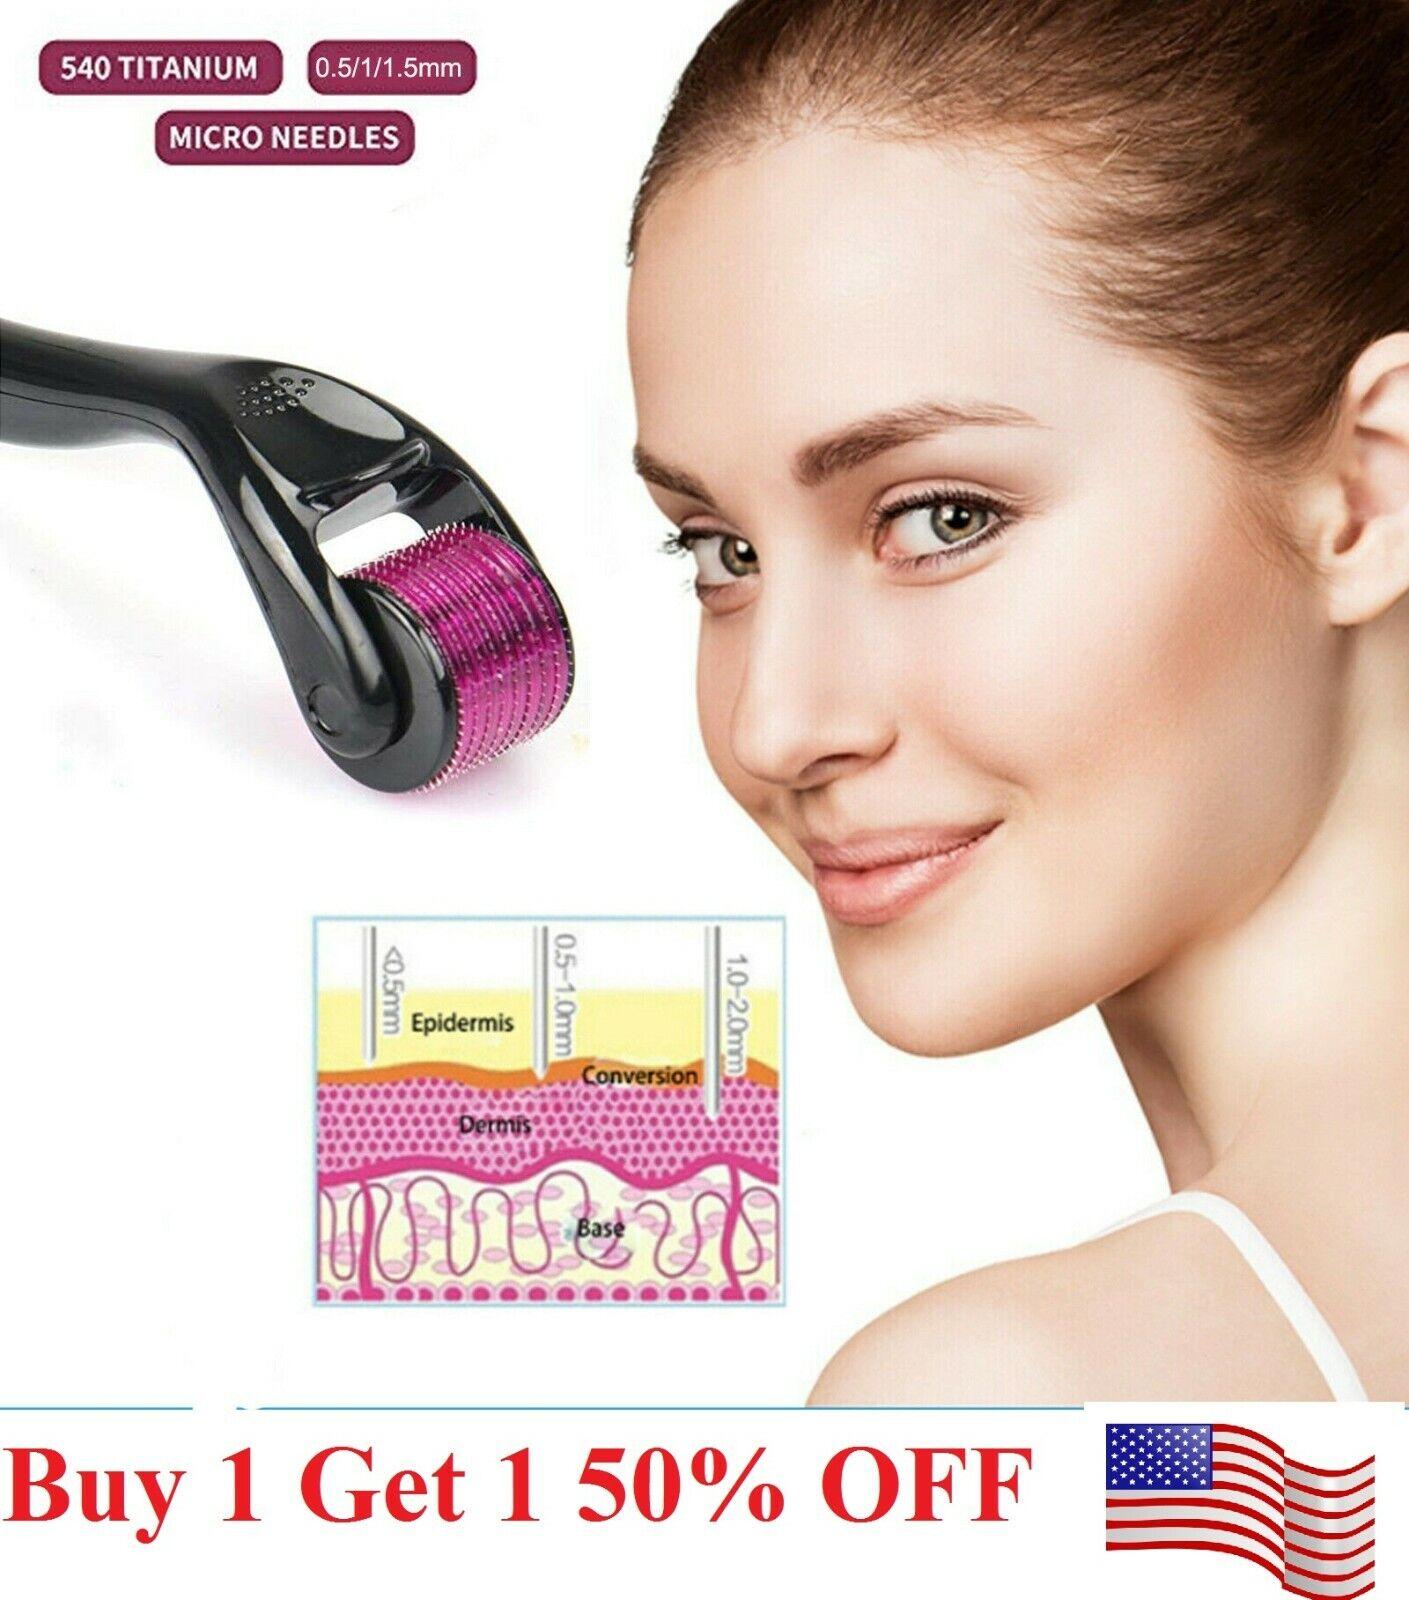 540 Titanium Micro Needle Scar Derma Roller Dermaroller Microneedle Skin Therapy Anti-Aging Products